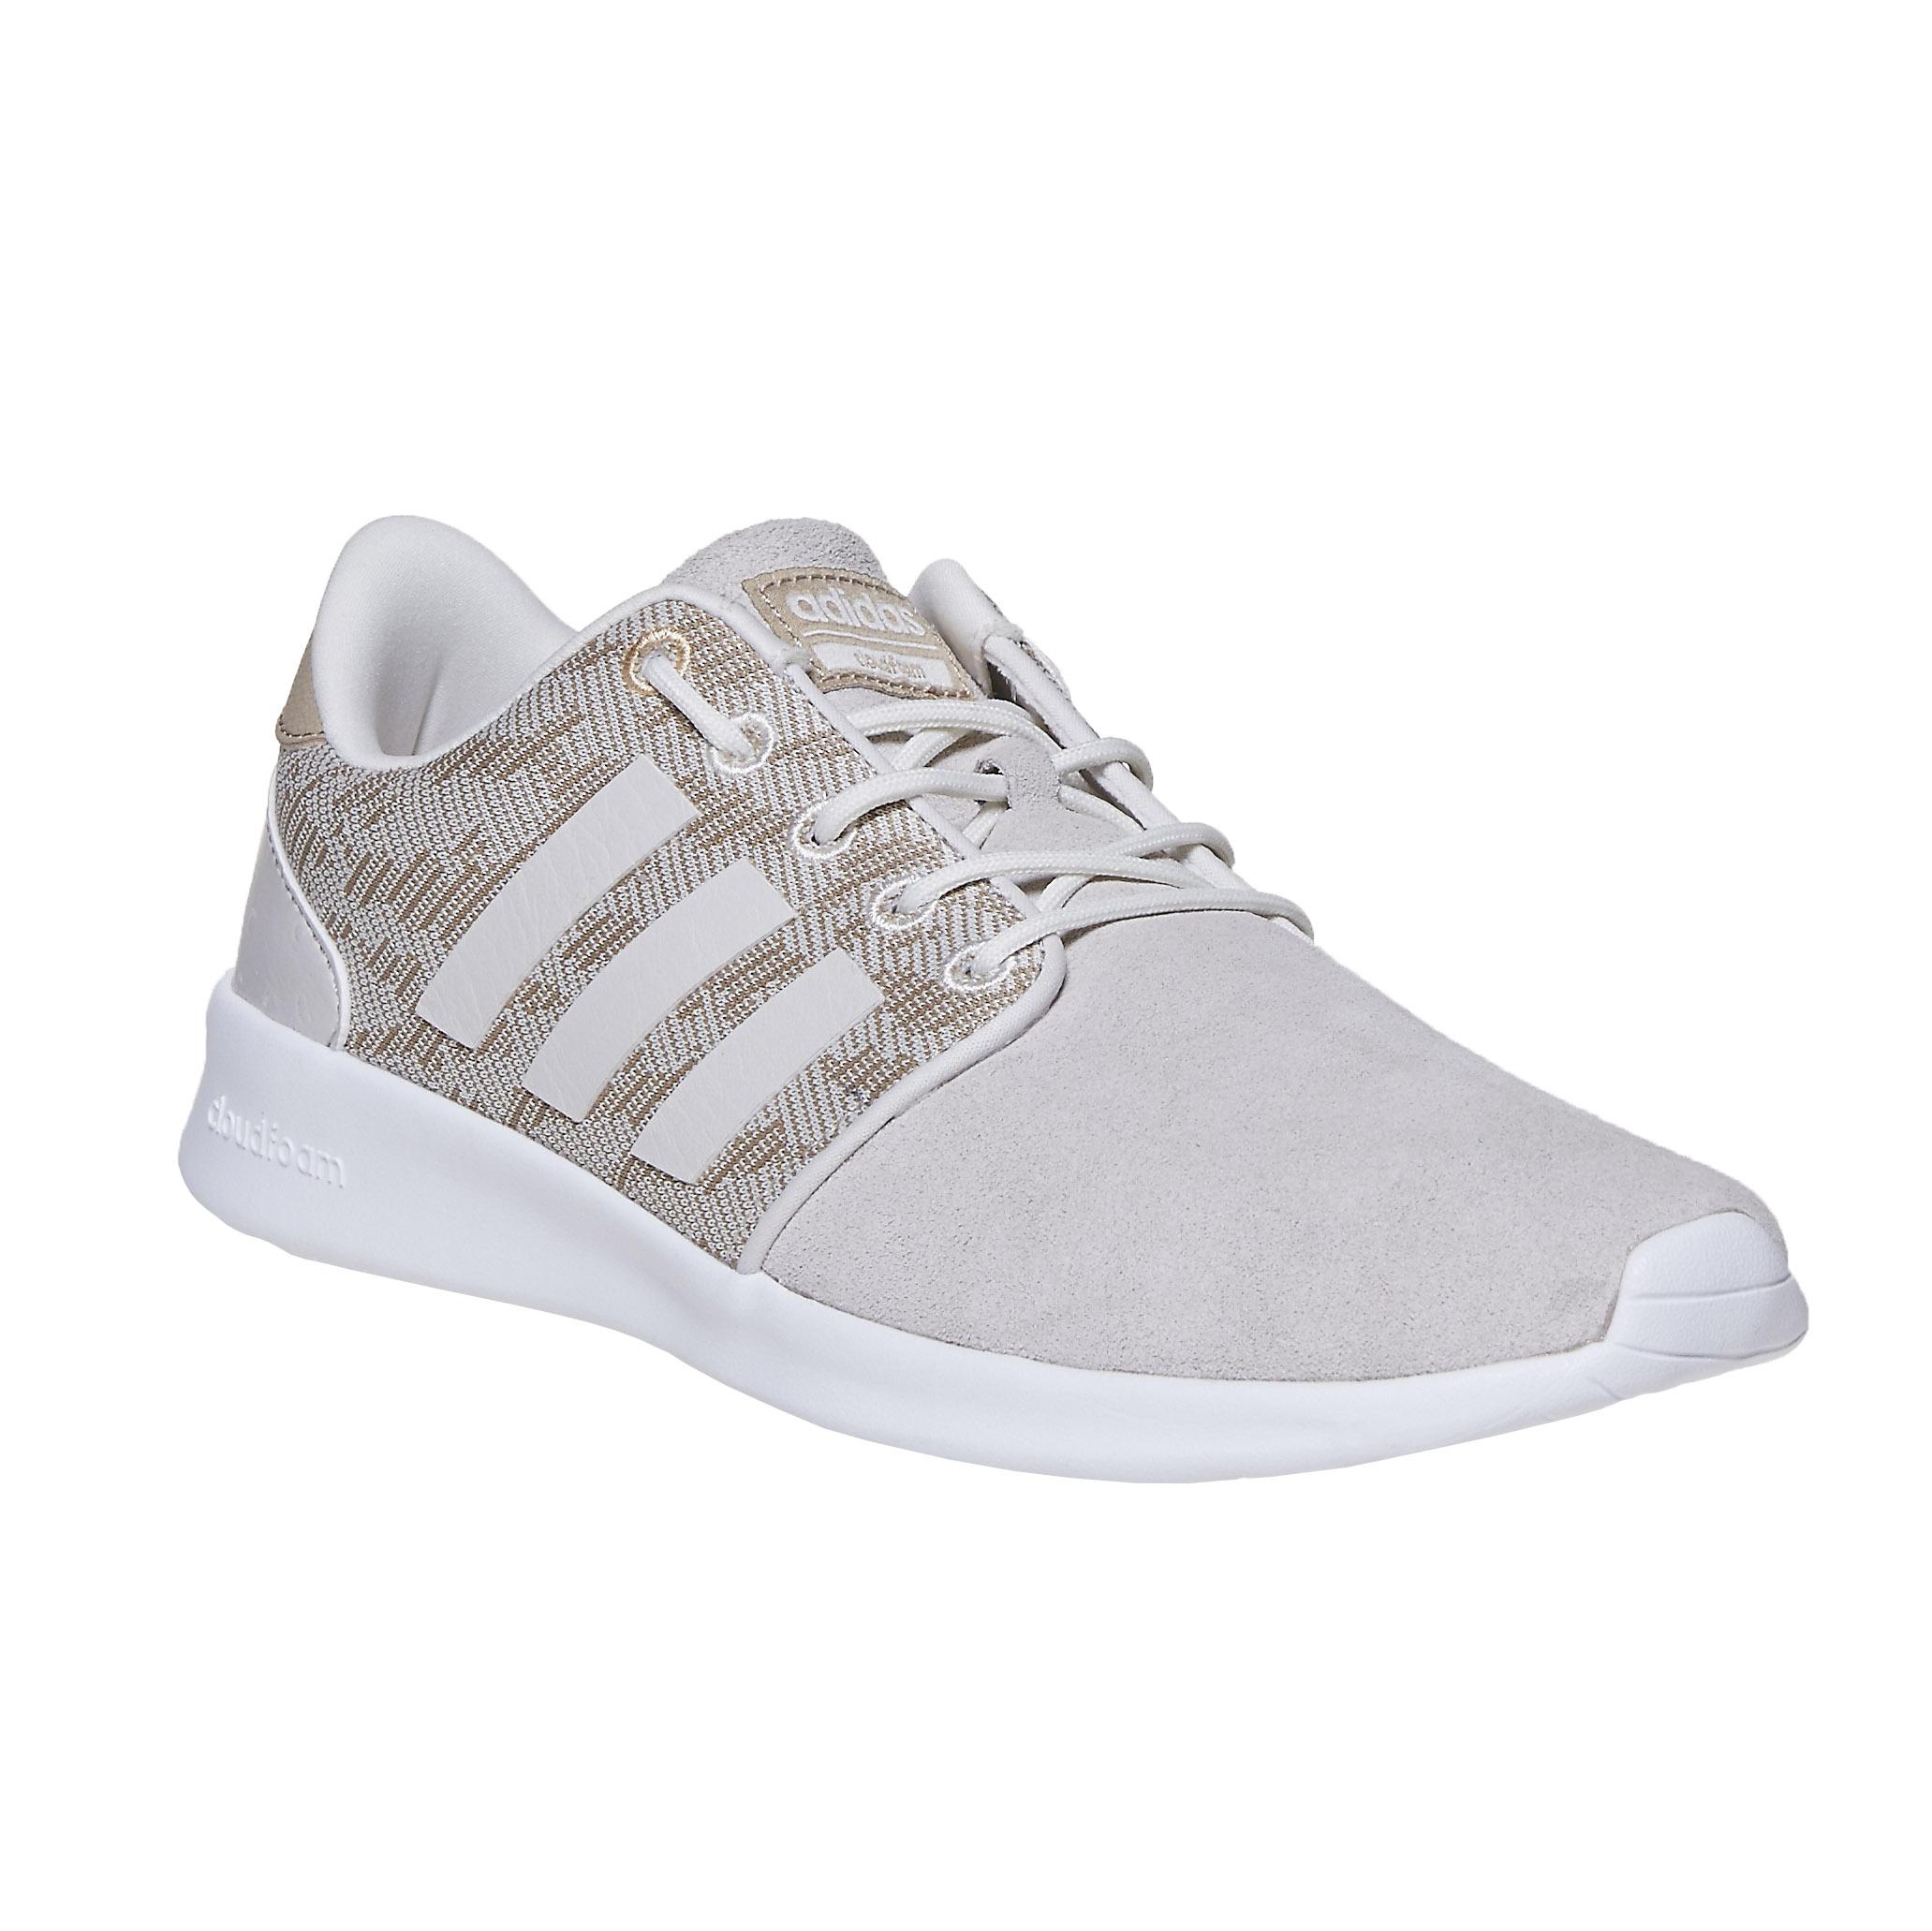 Adidas Ladies' patterned sneakers - All